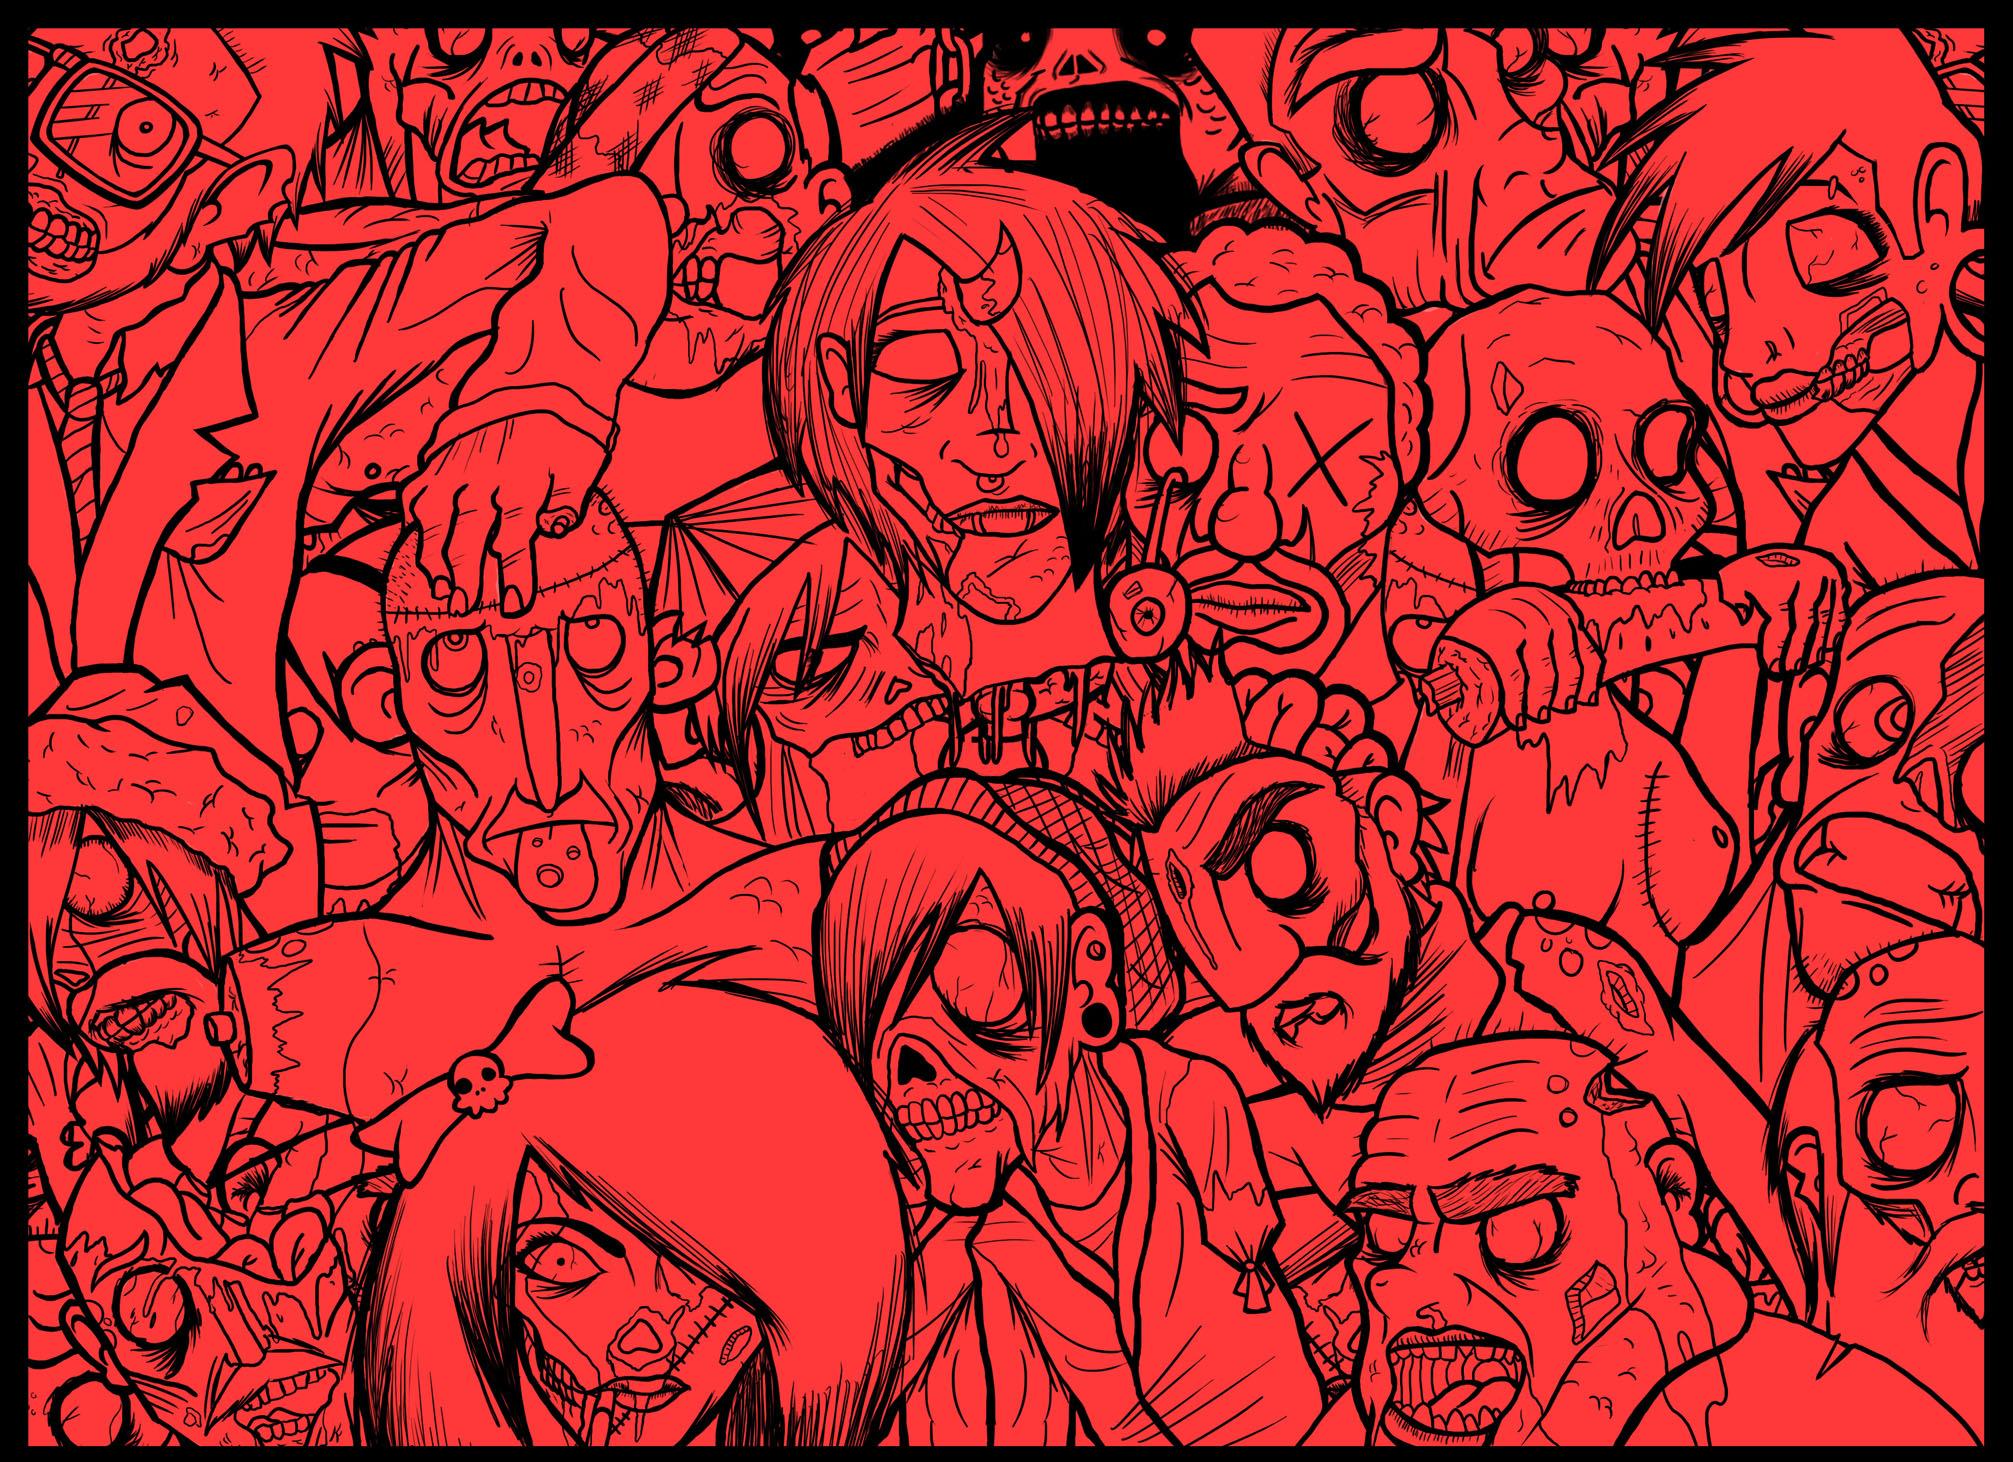 ZOMBIES! - wallpaper